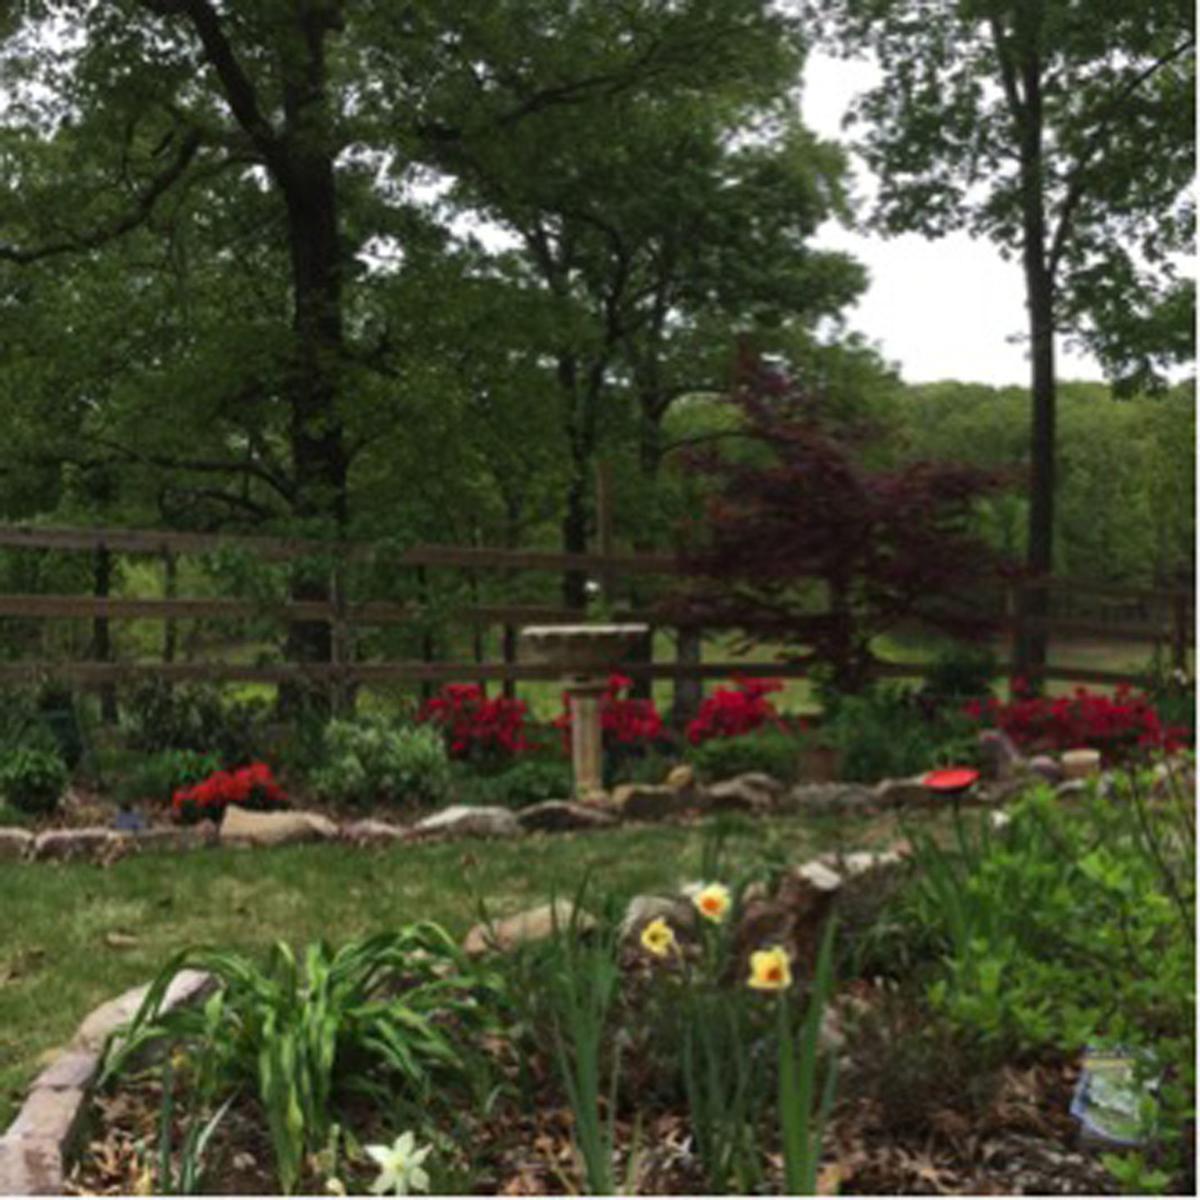 Gardening for mental health